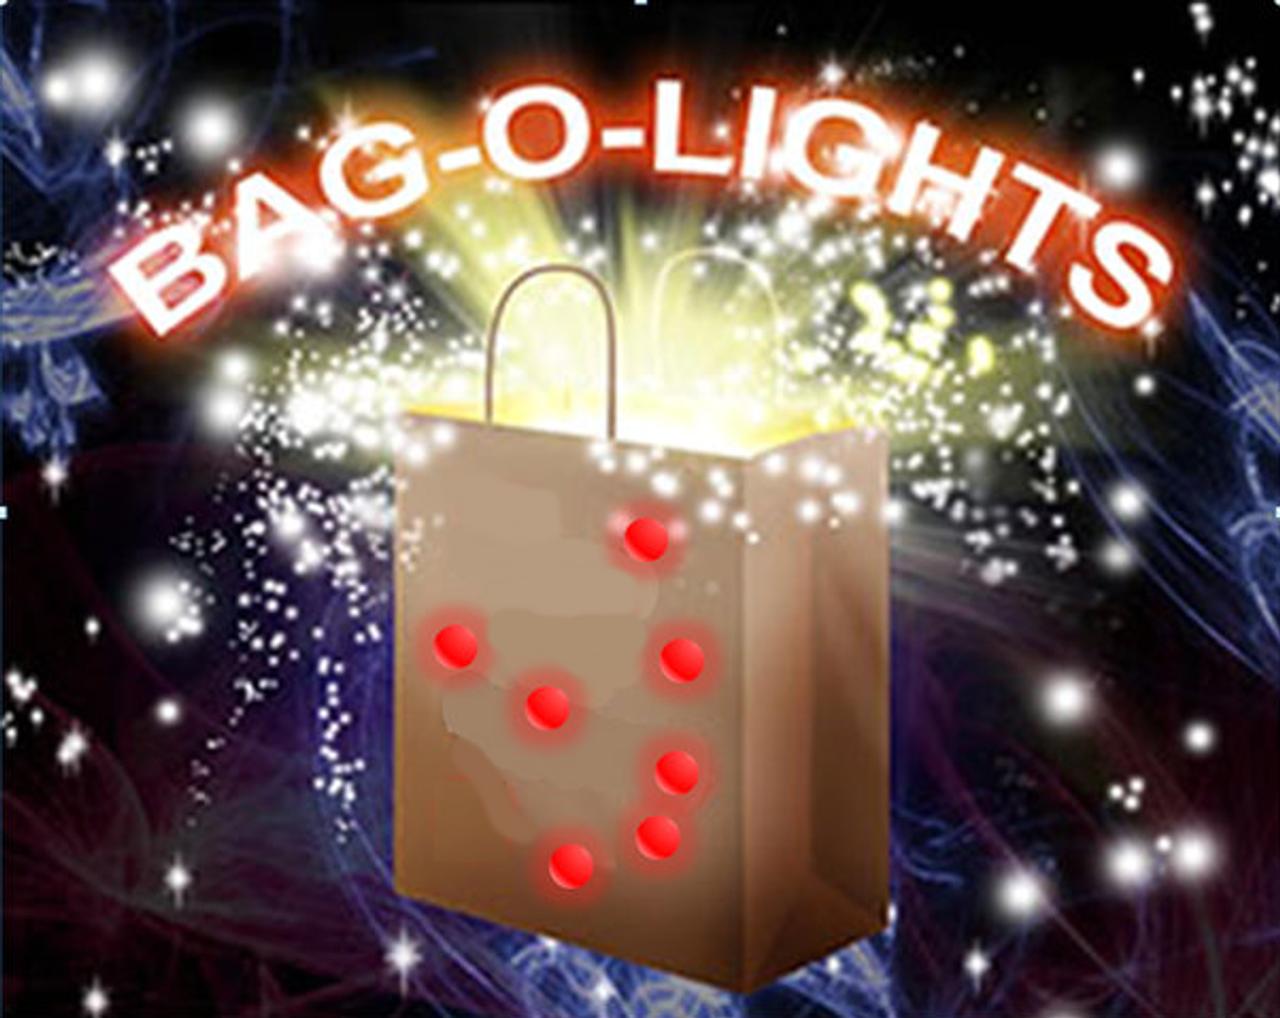 Bag-O-Lites professional version magic trick dilites